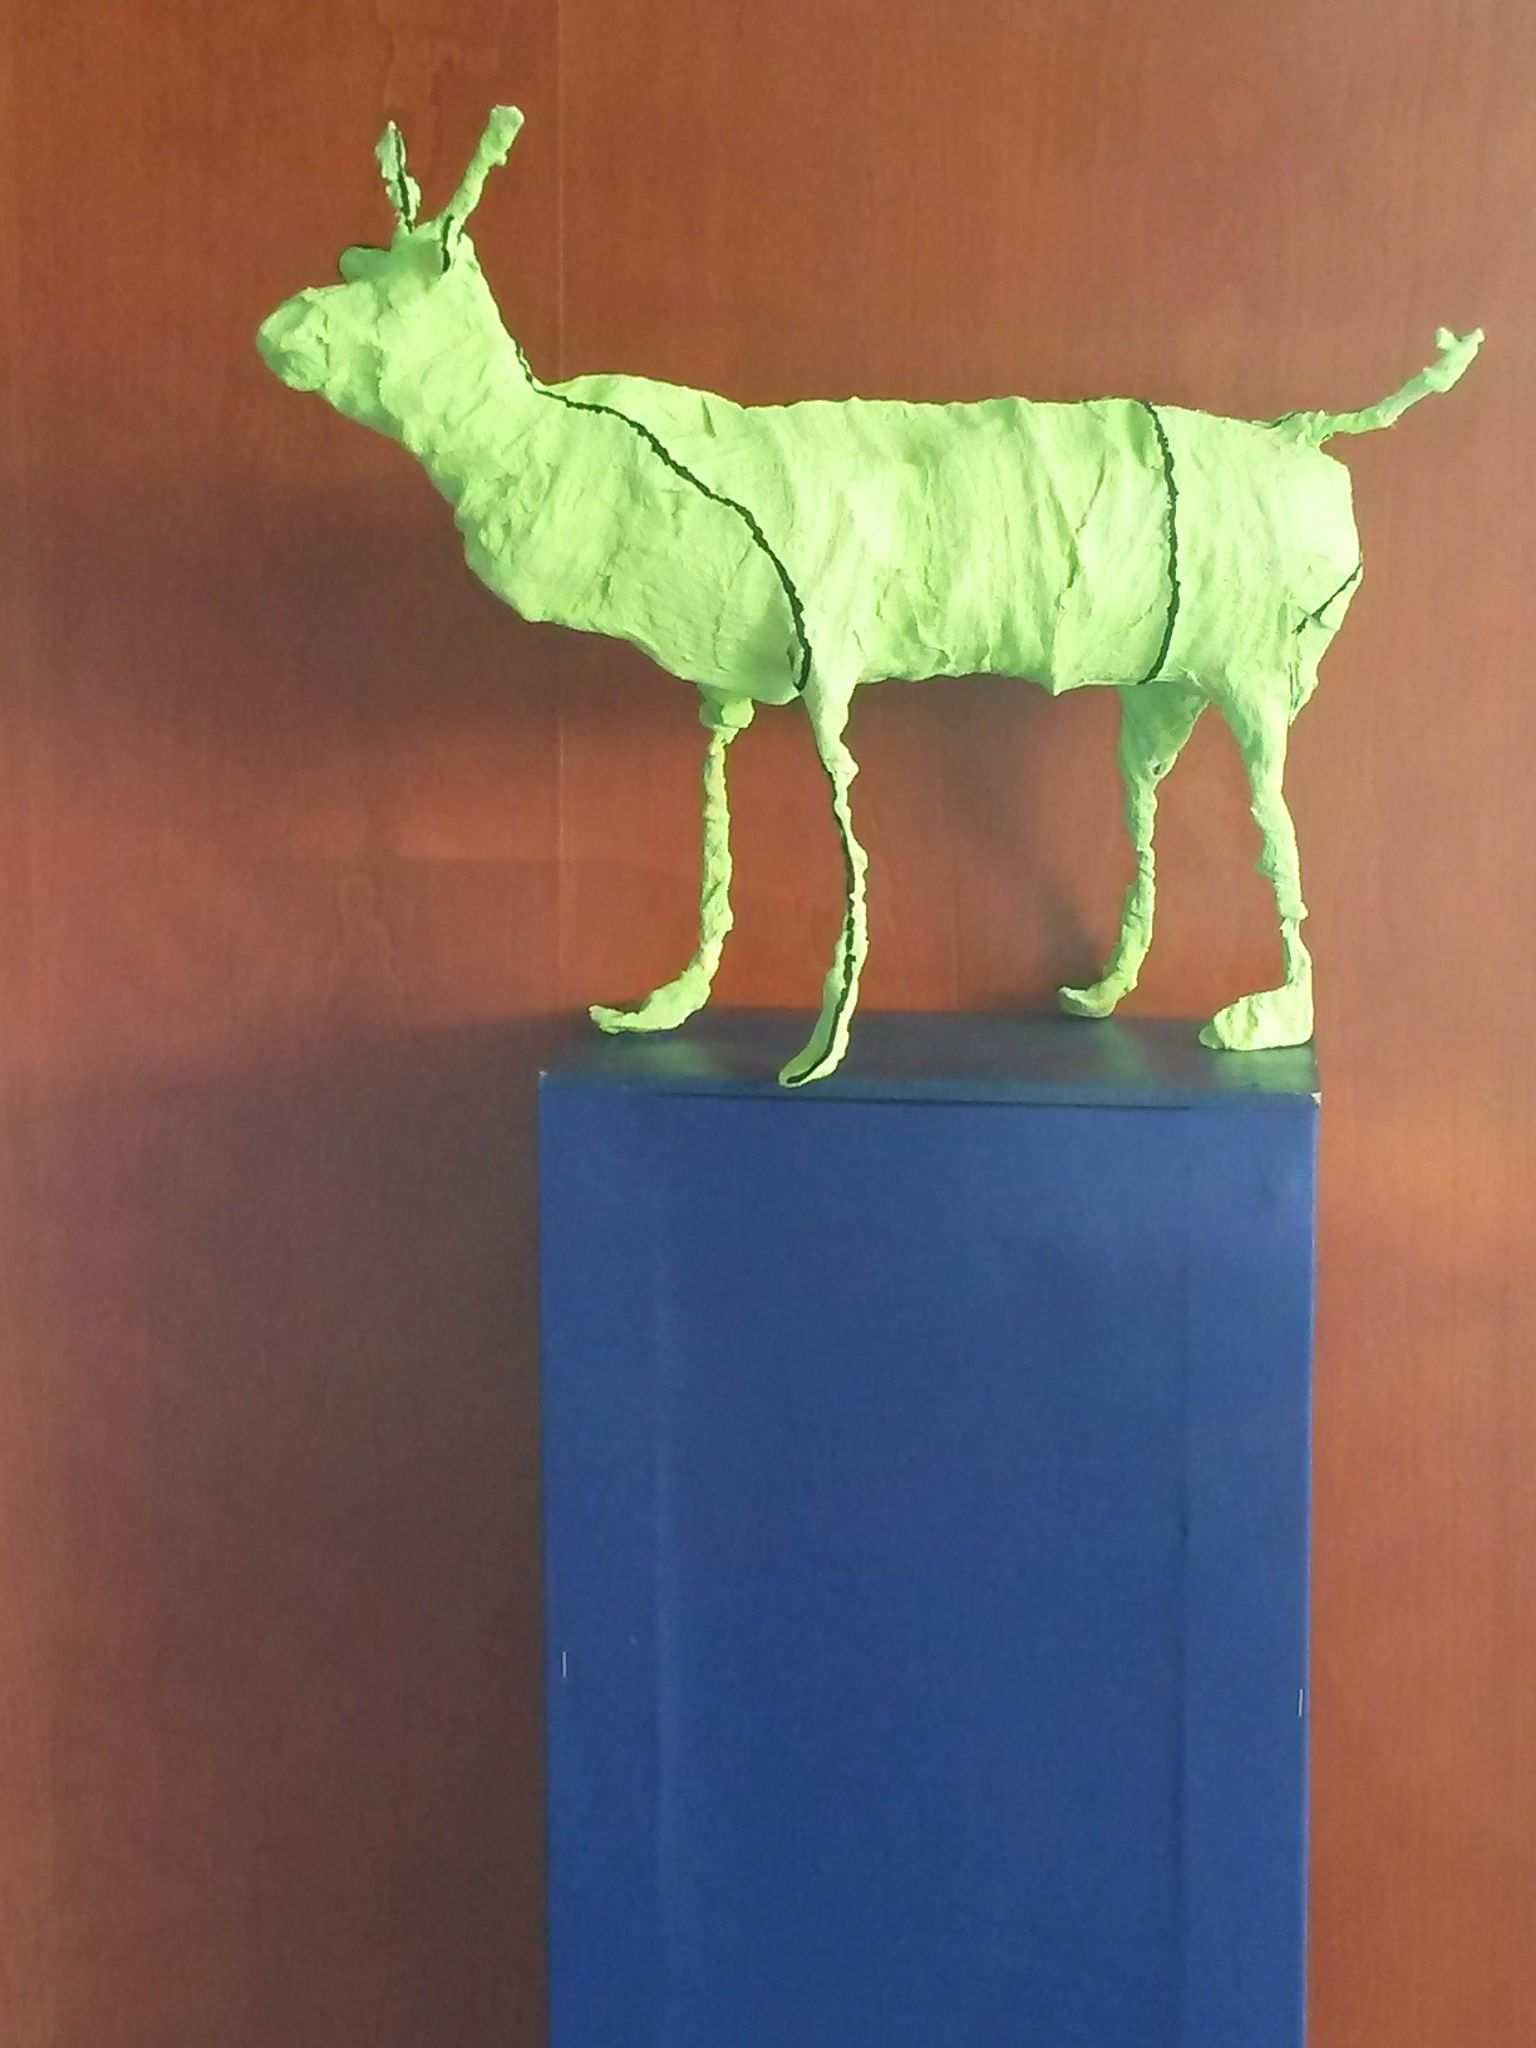 Draht-Gips-Tiere (Schülerarbeit) mit Acrylfarben bemalt | Tiere ...